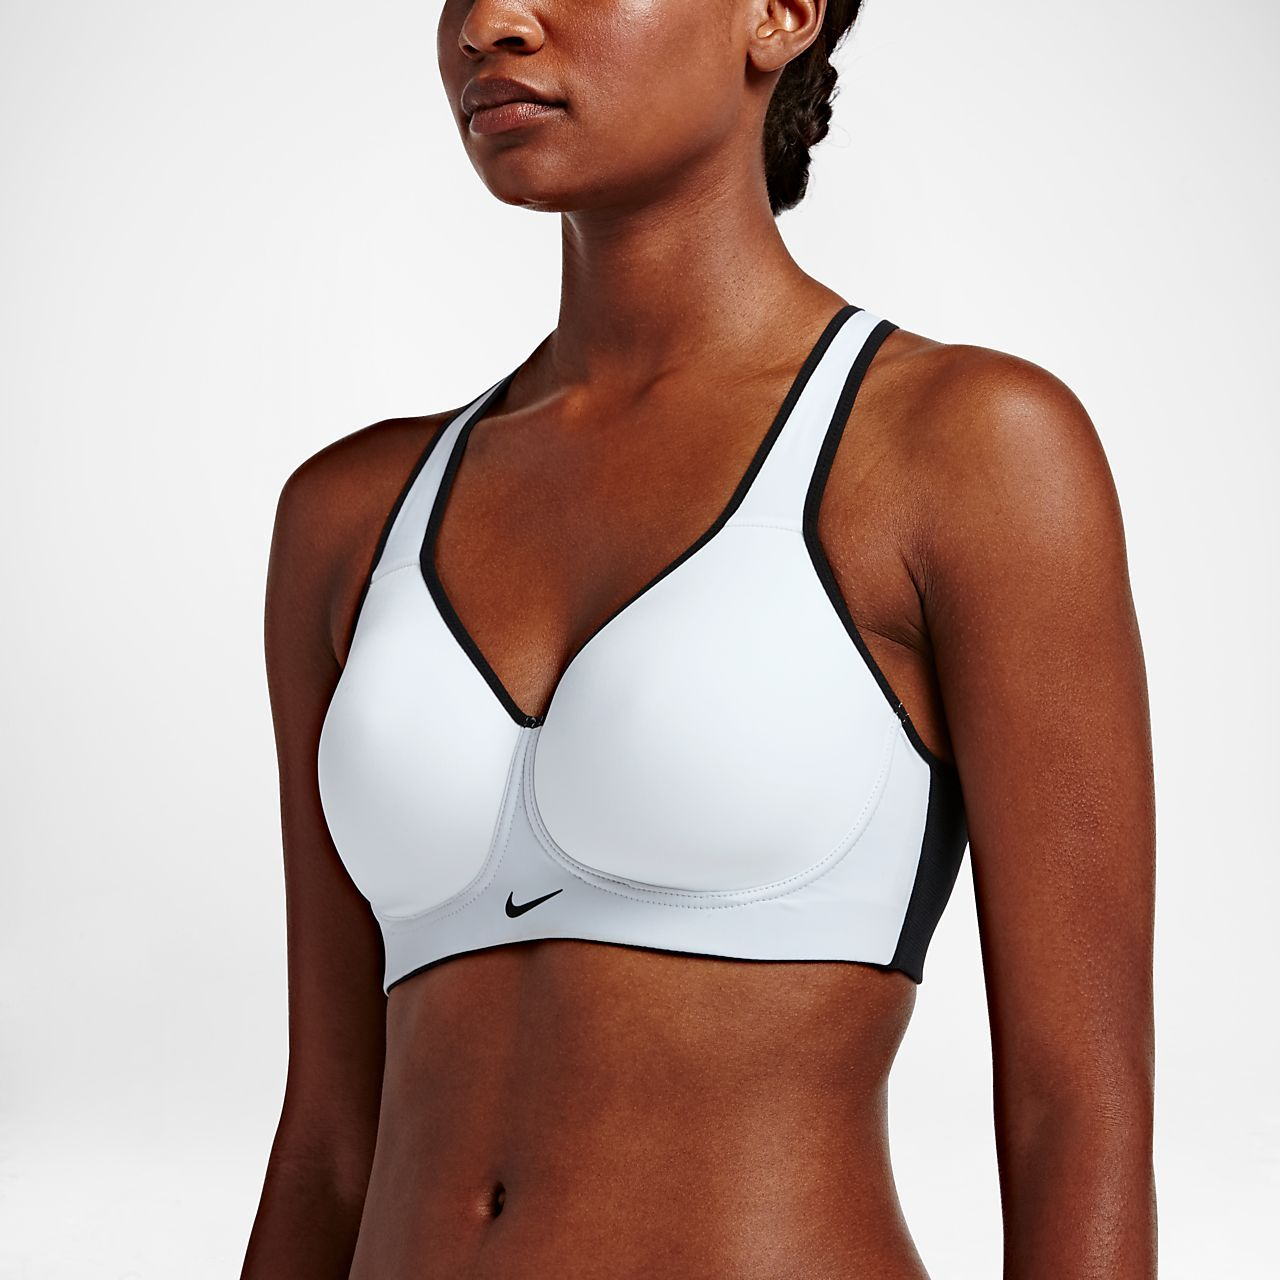 3e3485f34de Nike Rival Women s High Support Sports Bra Size 36D